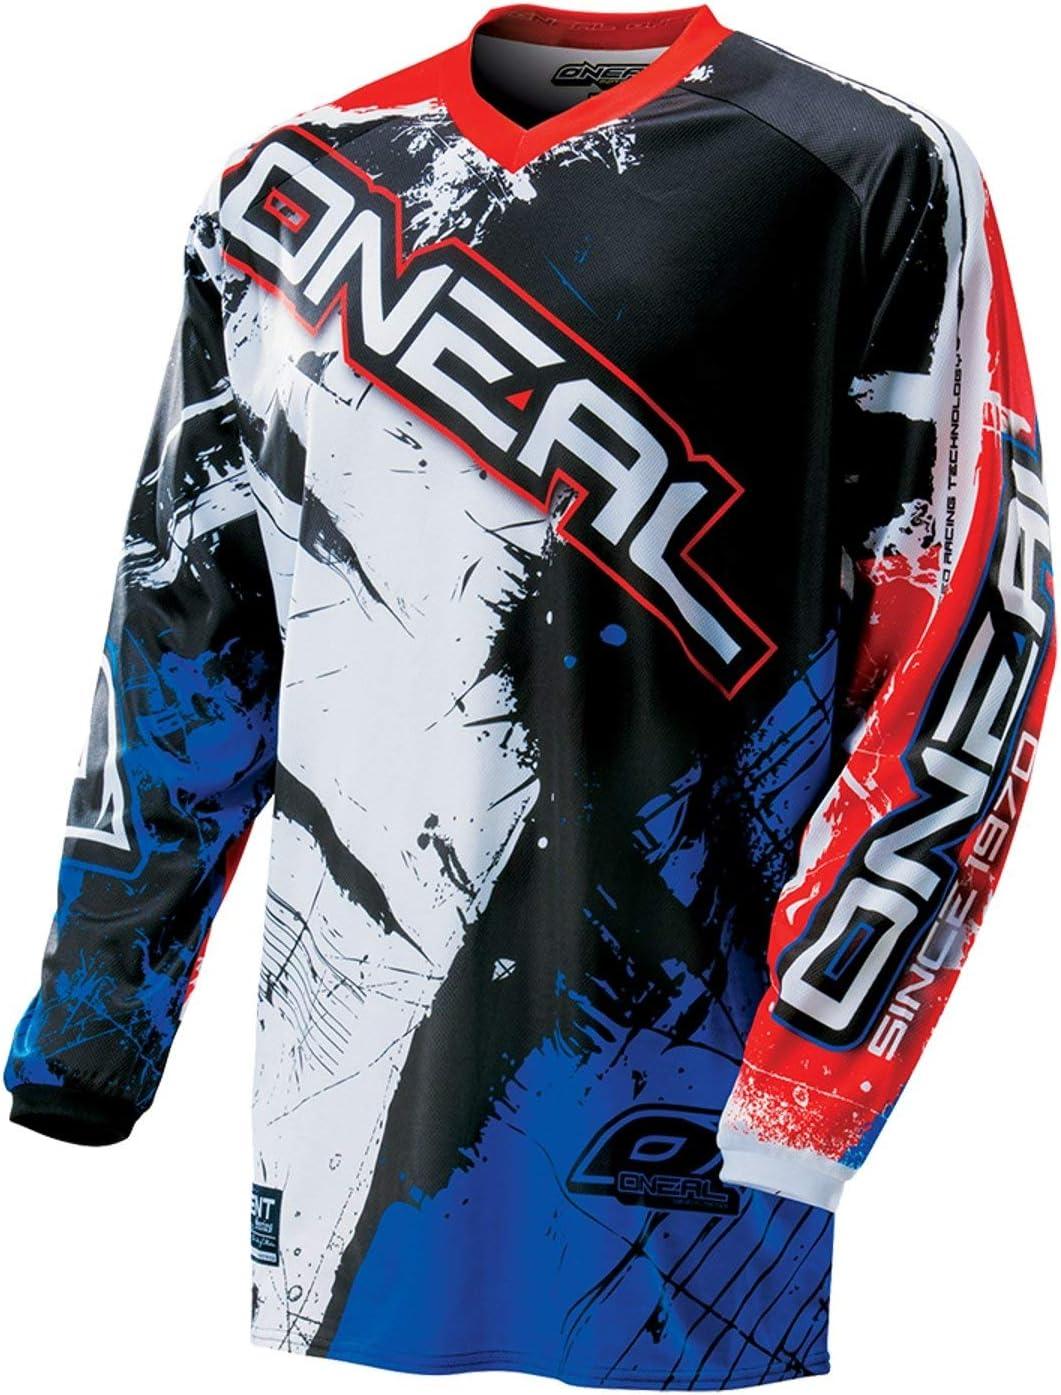 0024S-50 ONeal Element MX Jersey Shocker Schwarz Rot Blau